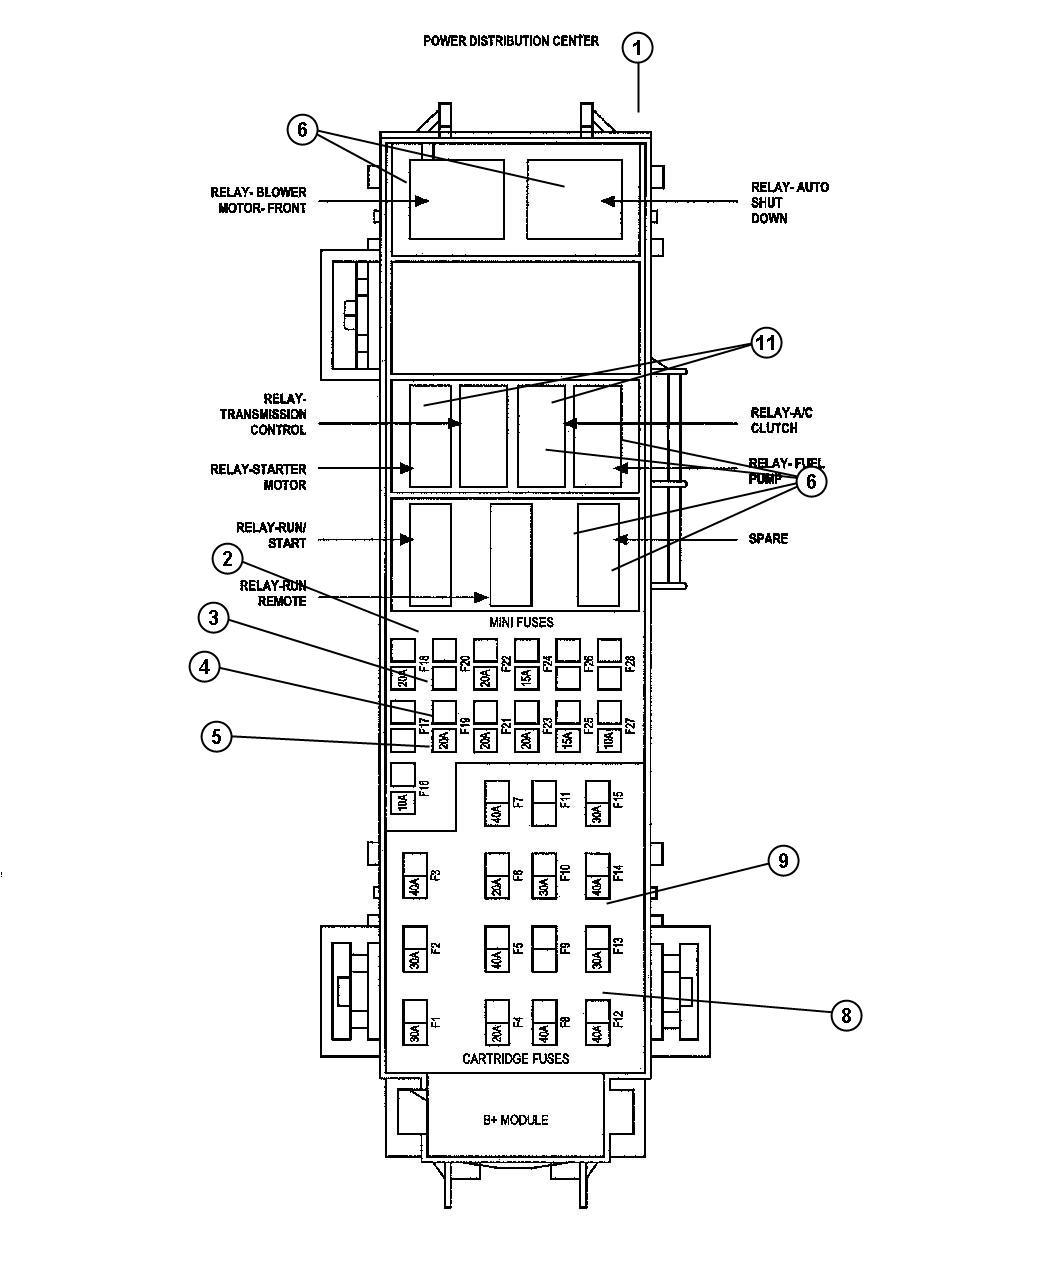 2008 dodge durango power distribution center